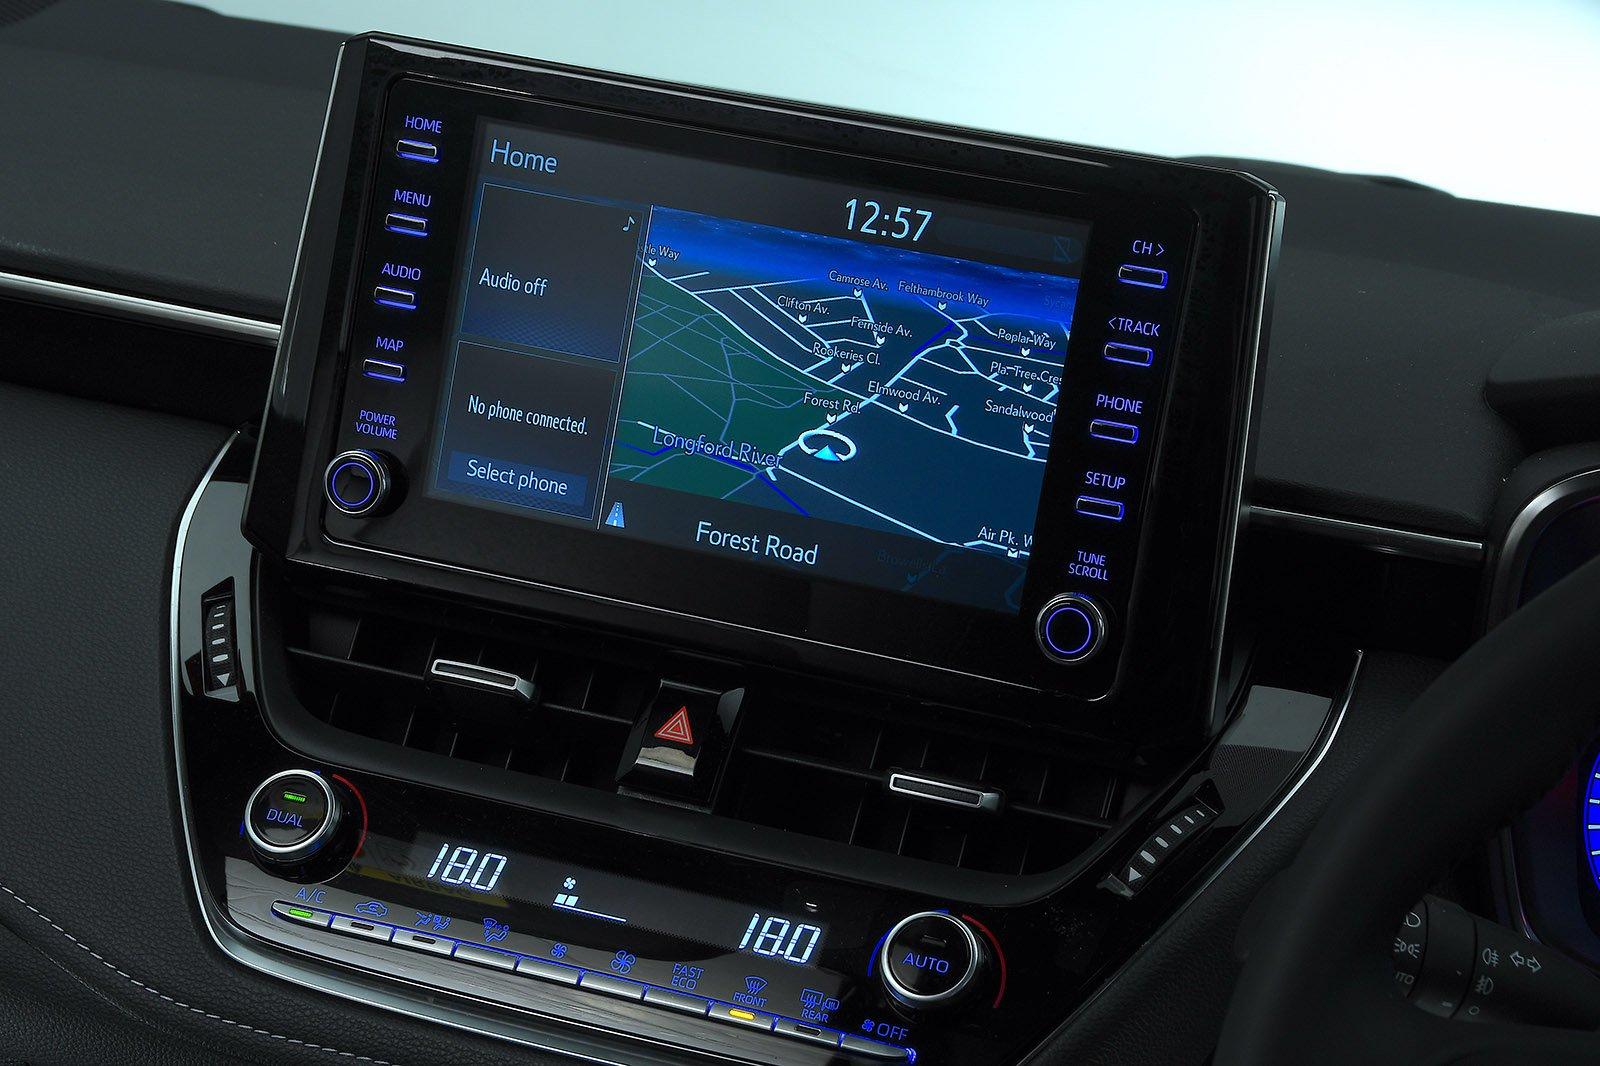 Toyota Corolla Touring Sport infotainment